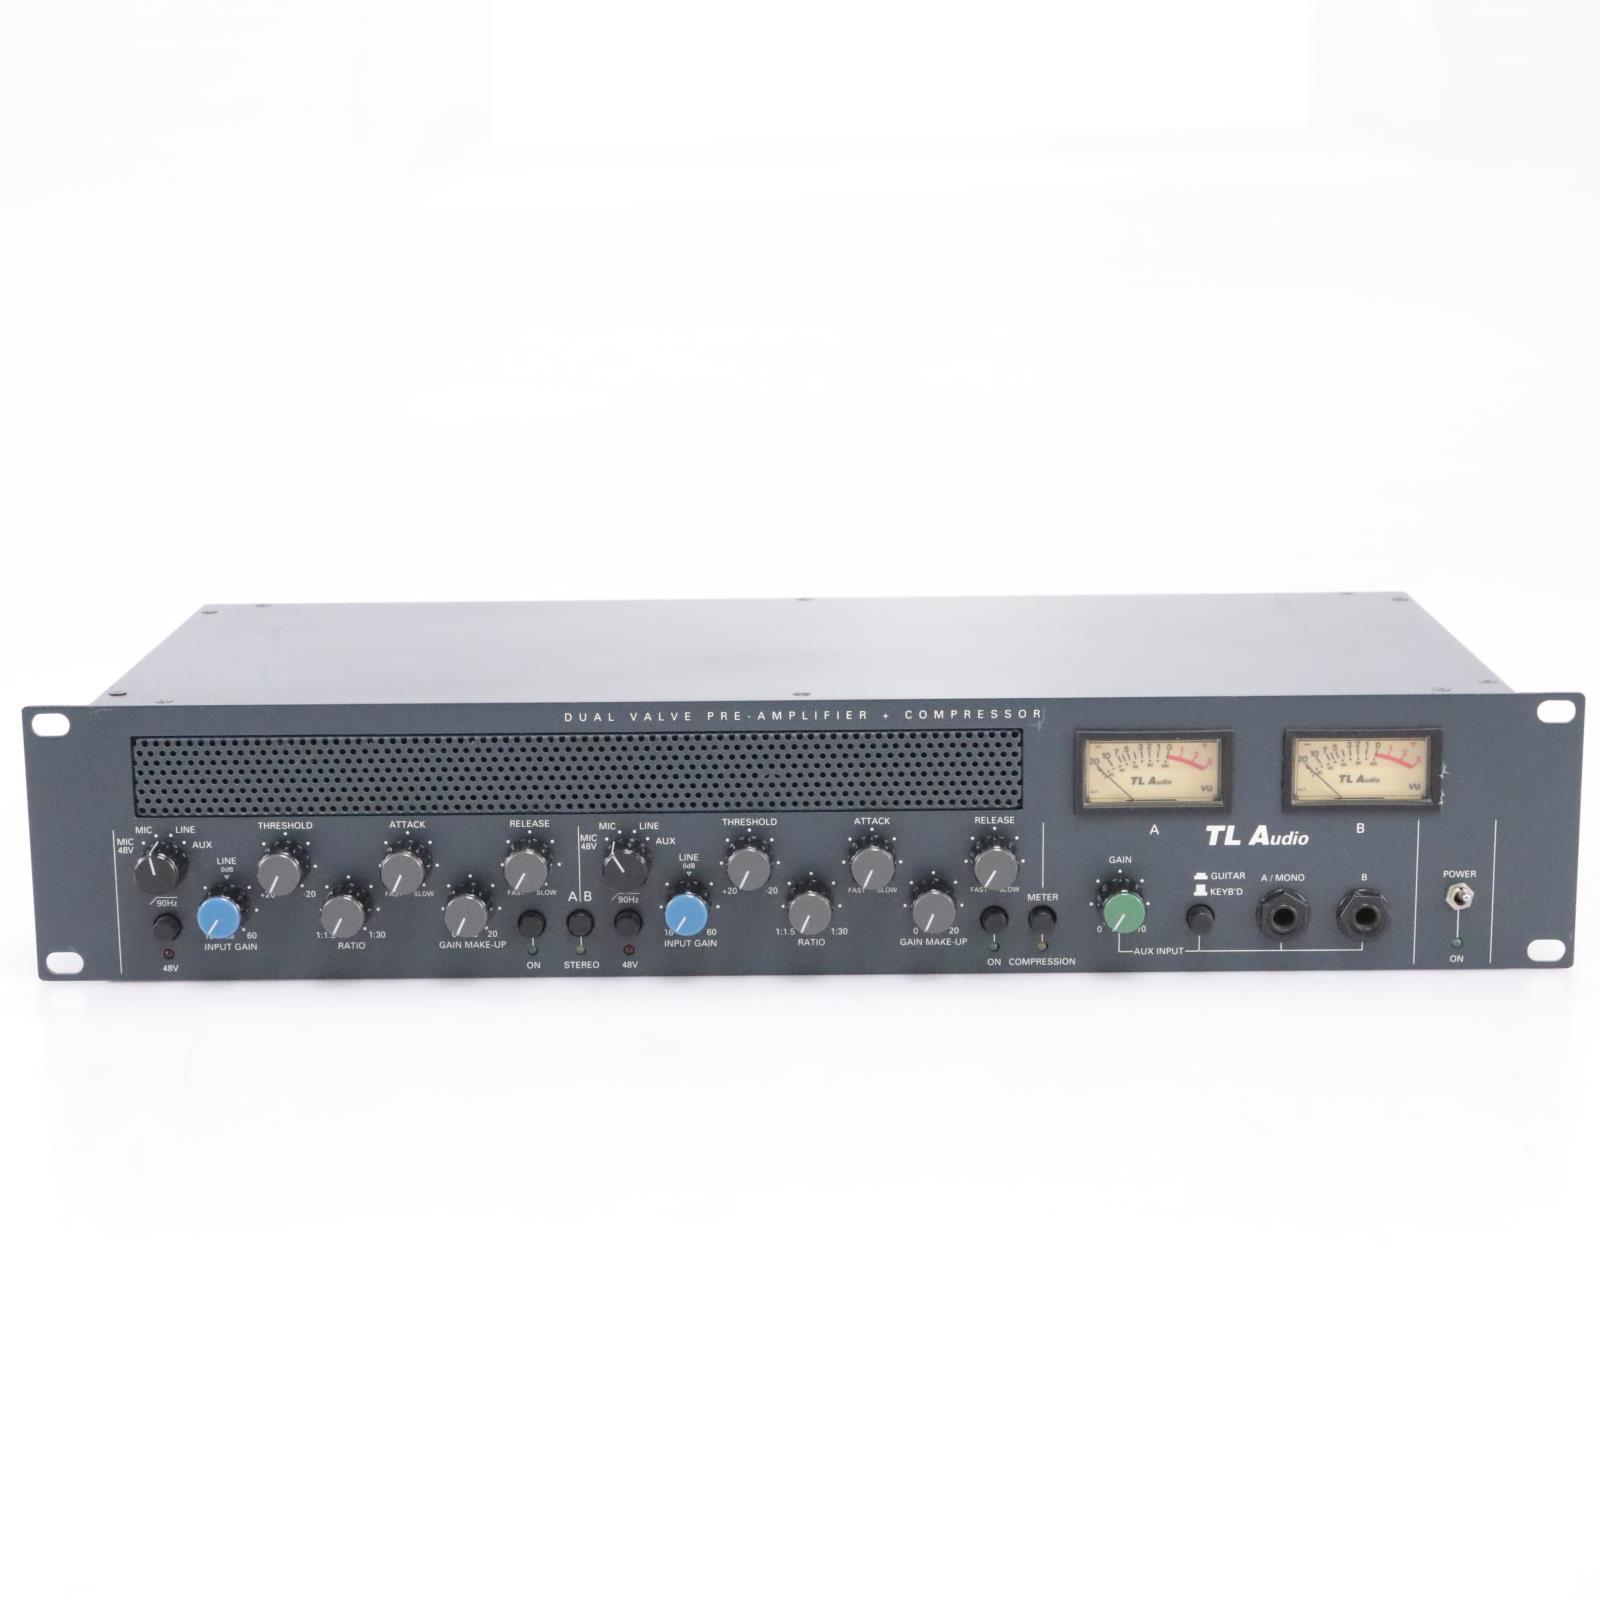 TL Audio C-1 Dual Valve Preamplifier Compressor Stereo Preamp #43747